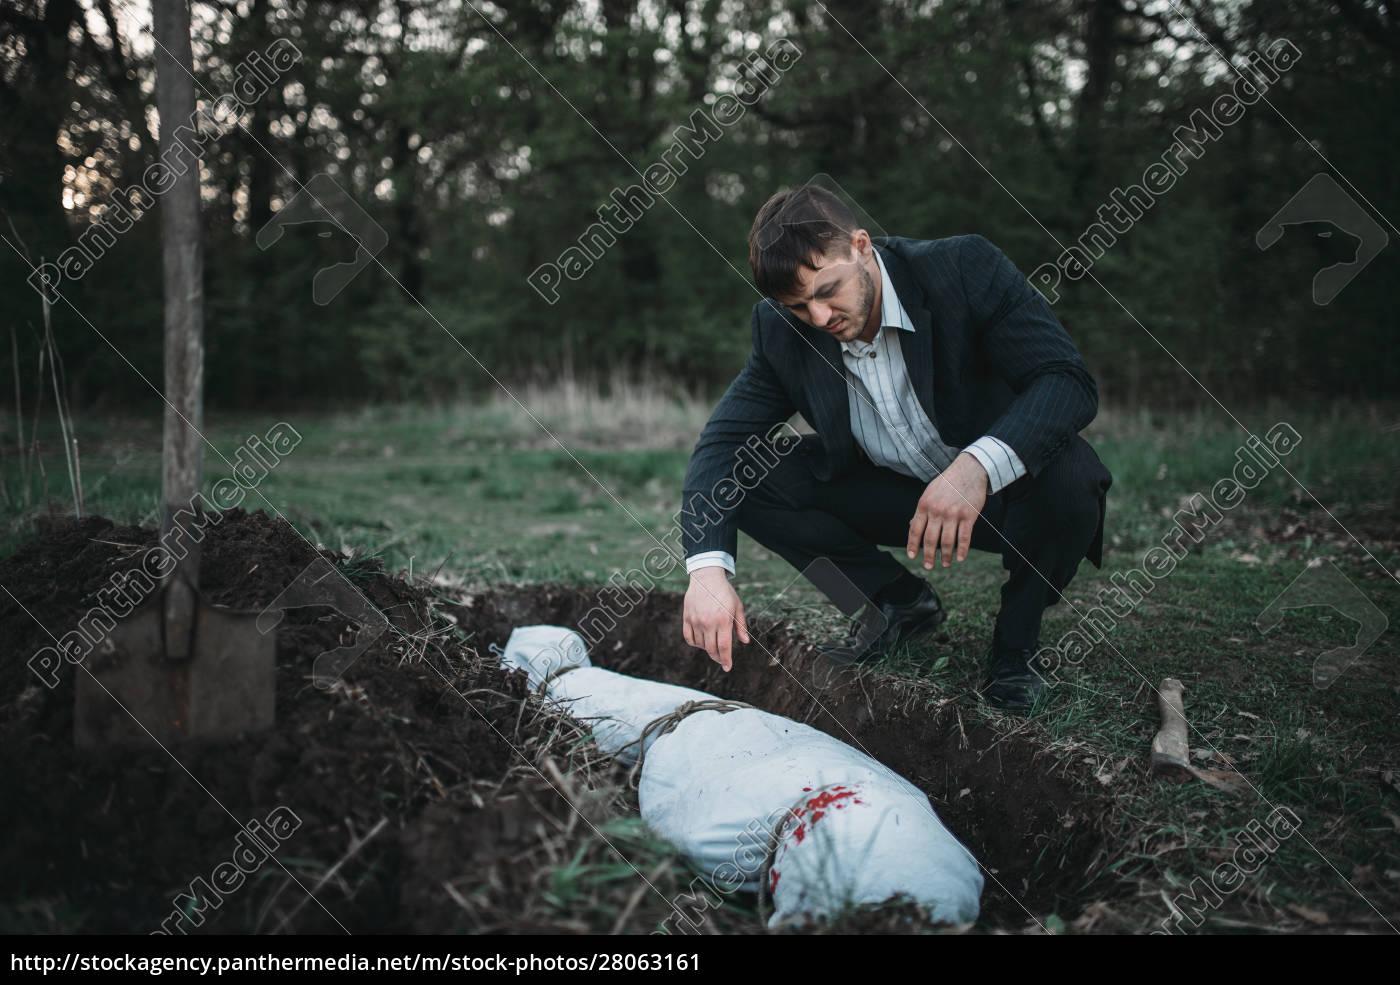 maniac, against, grave, , serial, murderer, concept - 28063161